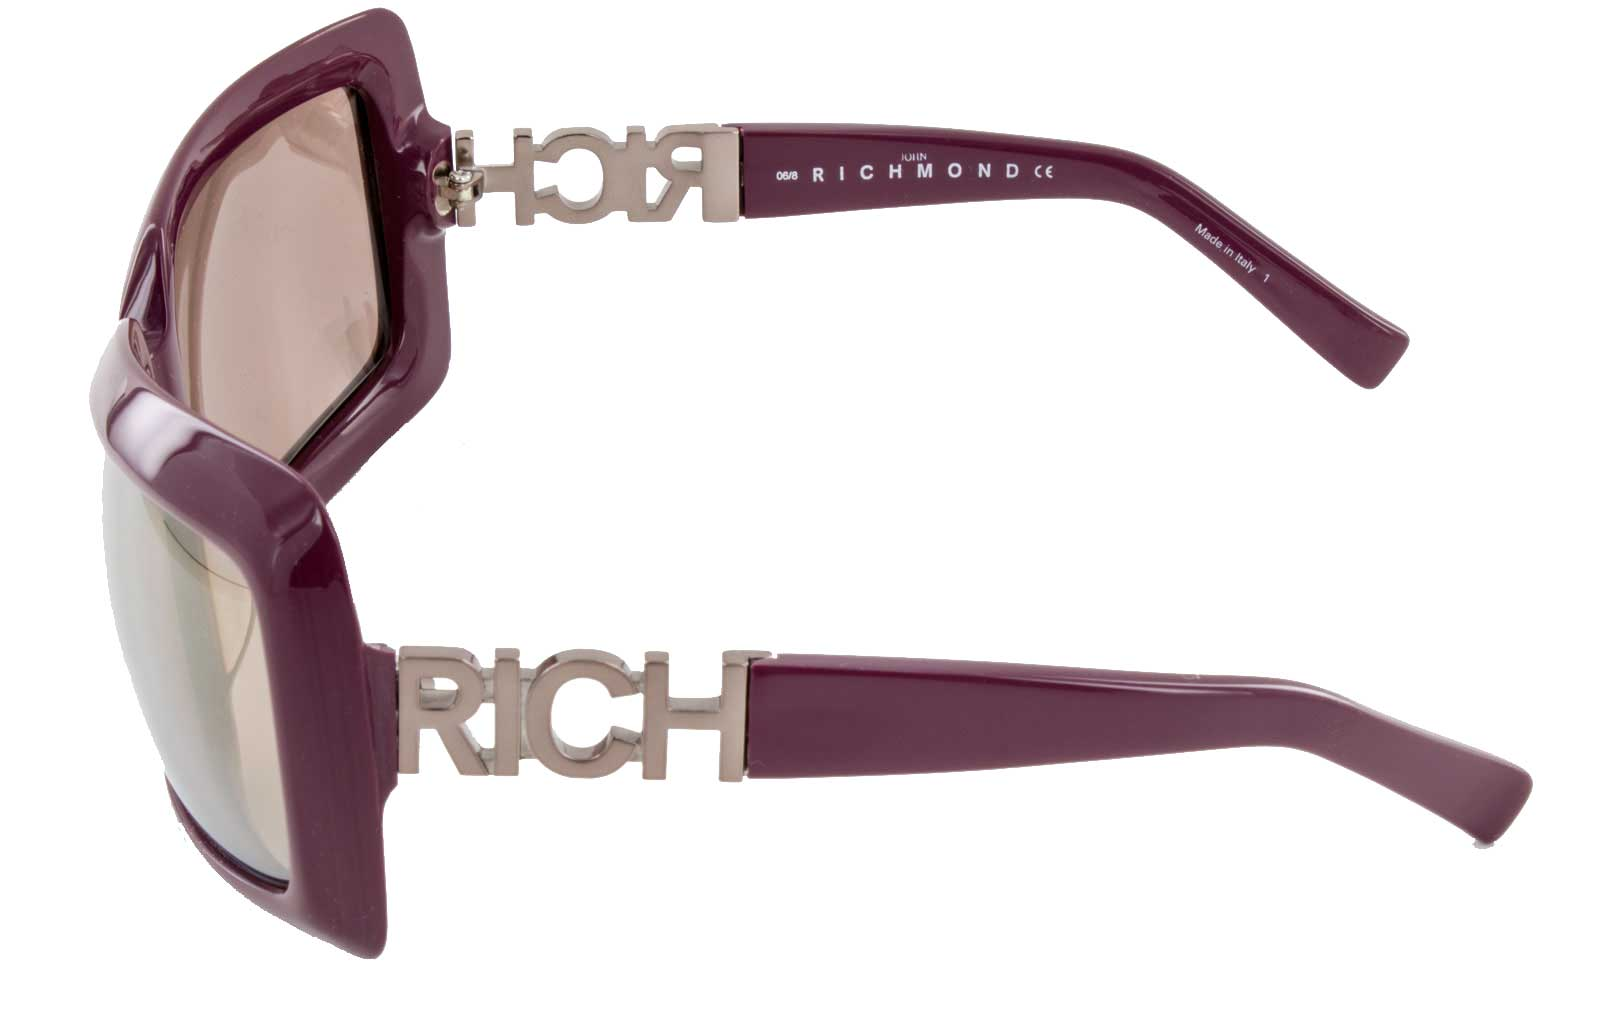 John Richmond Sonnenbrille JR58404 100% UV Schutz Vollrandbrille lila silber